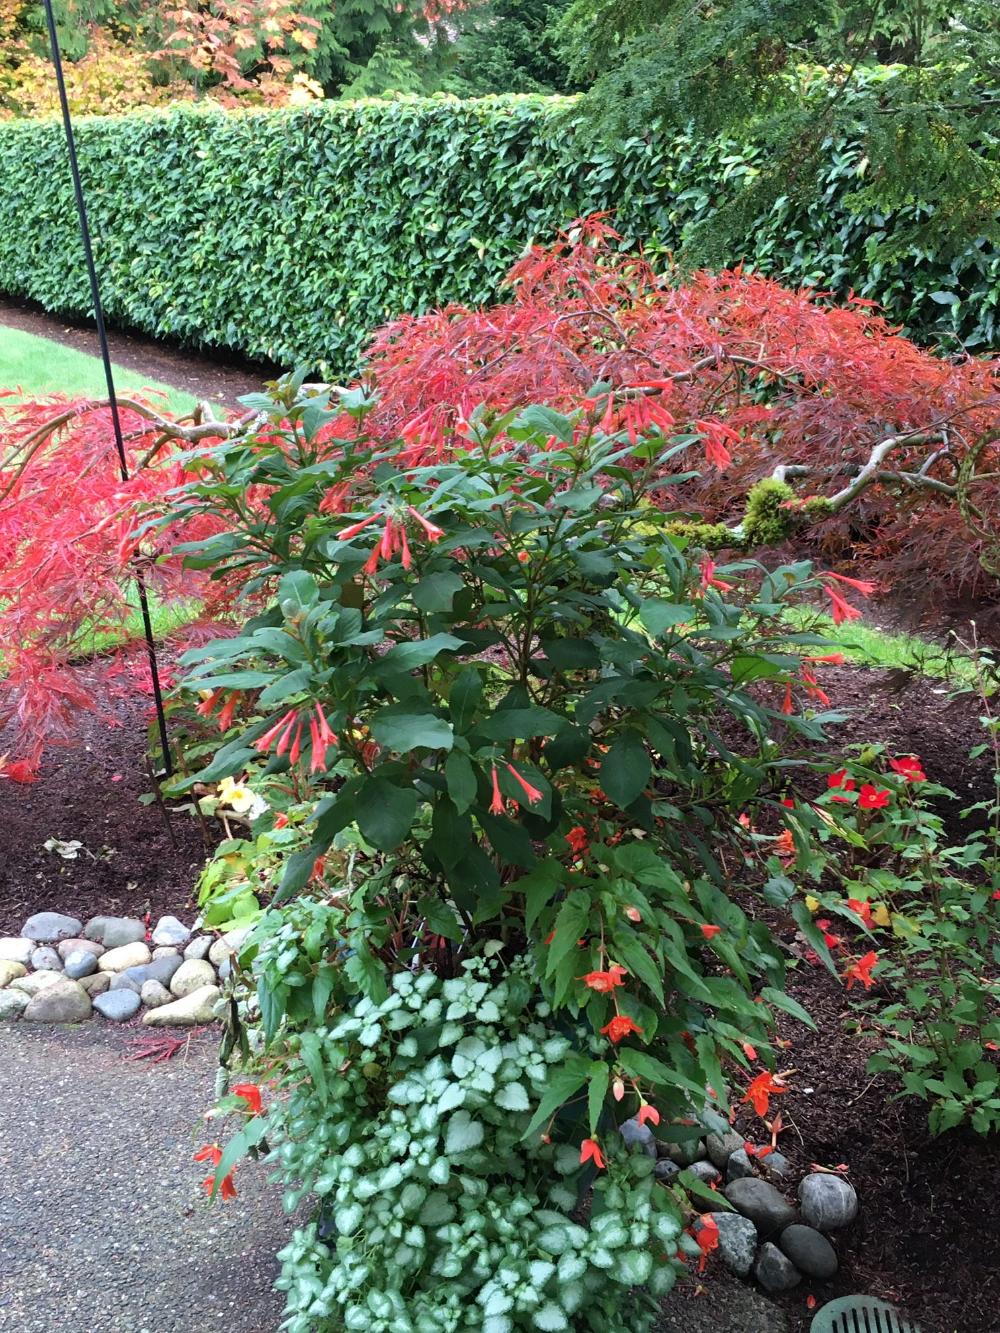 e6779246c6ff0ee83ea499ef6b84c1c7 - Gardening With Oregon Native Plants West Of The Cascades